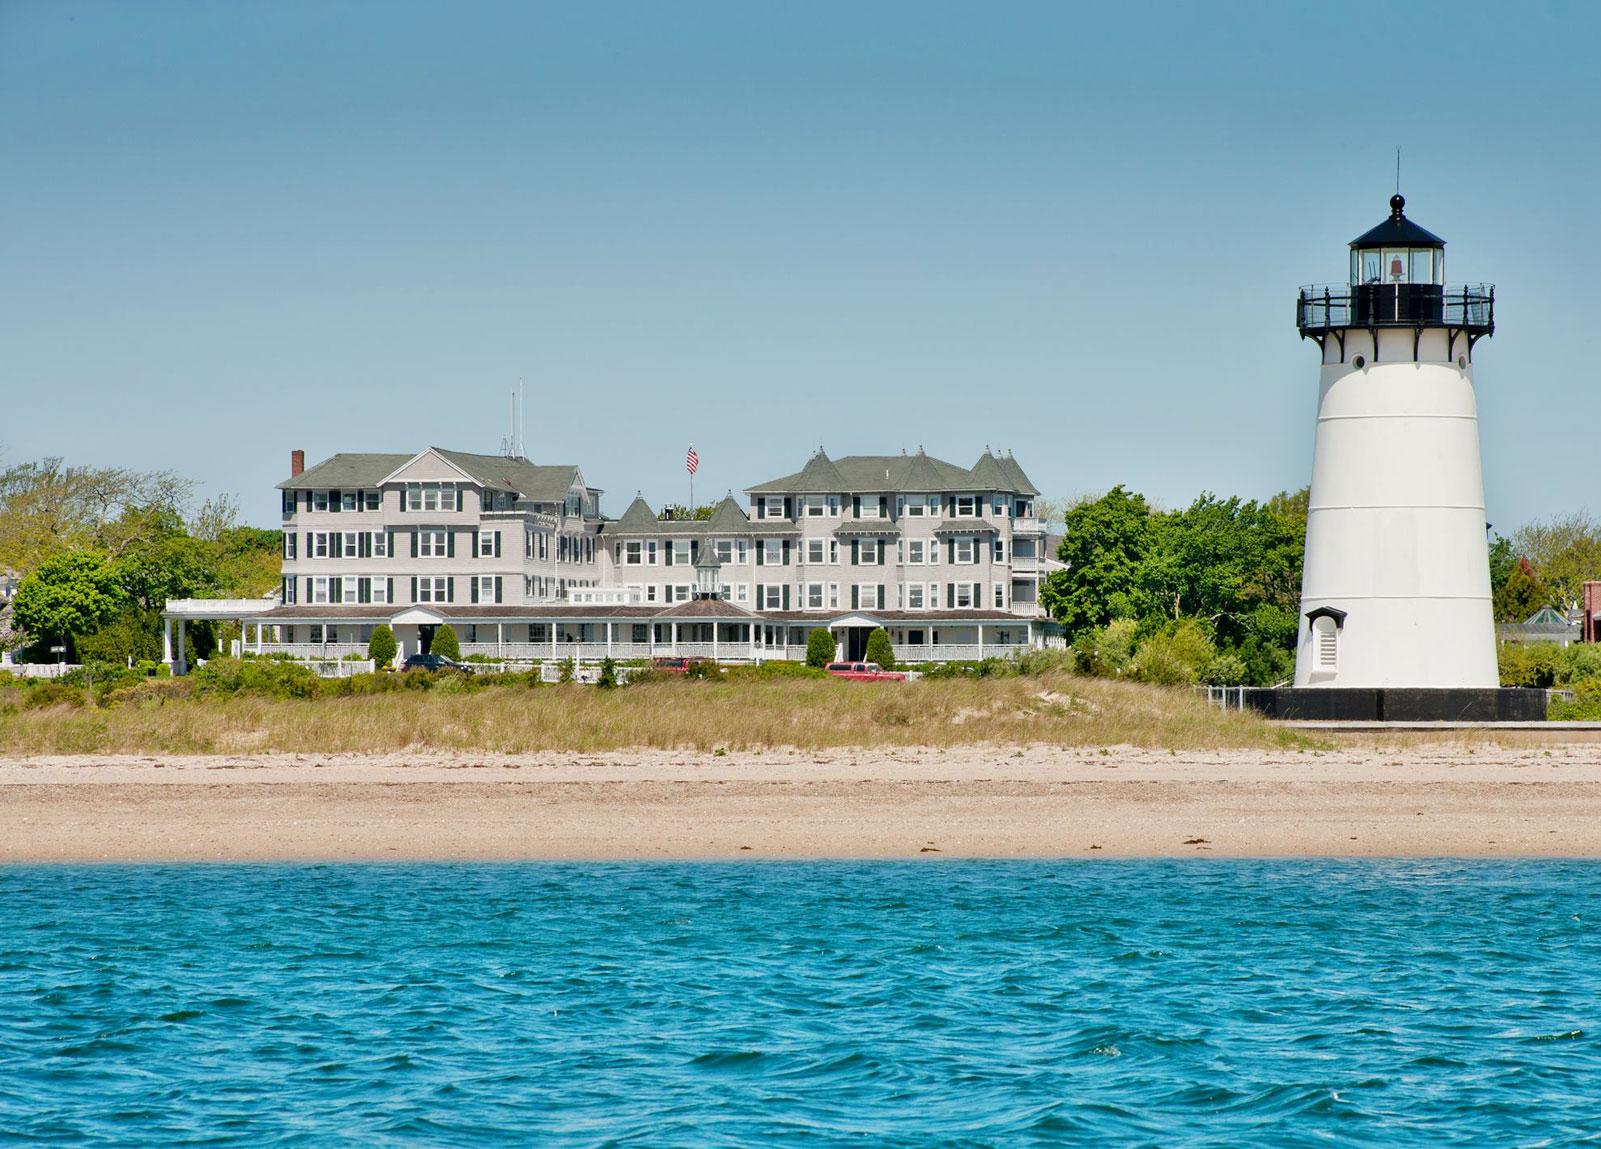 3-Hour Marthas Vineyard Island Tour from Oak Bluffs from